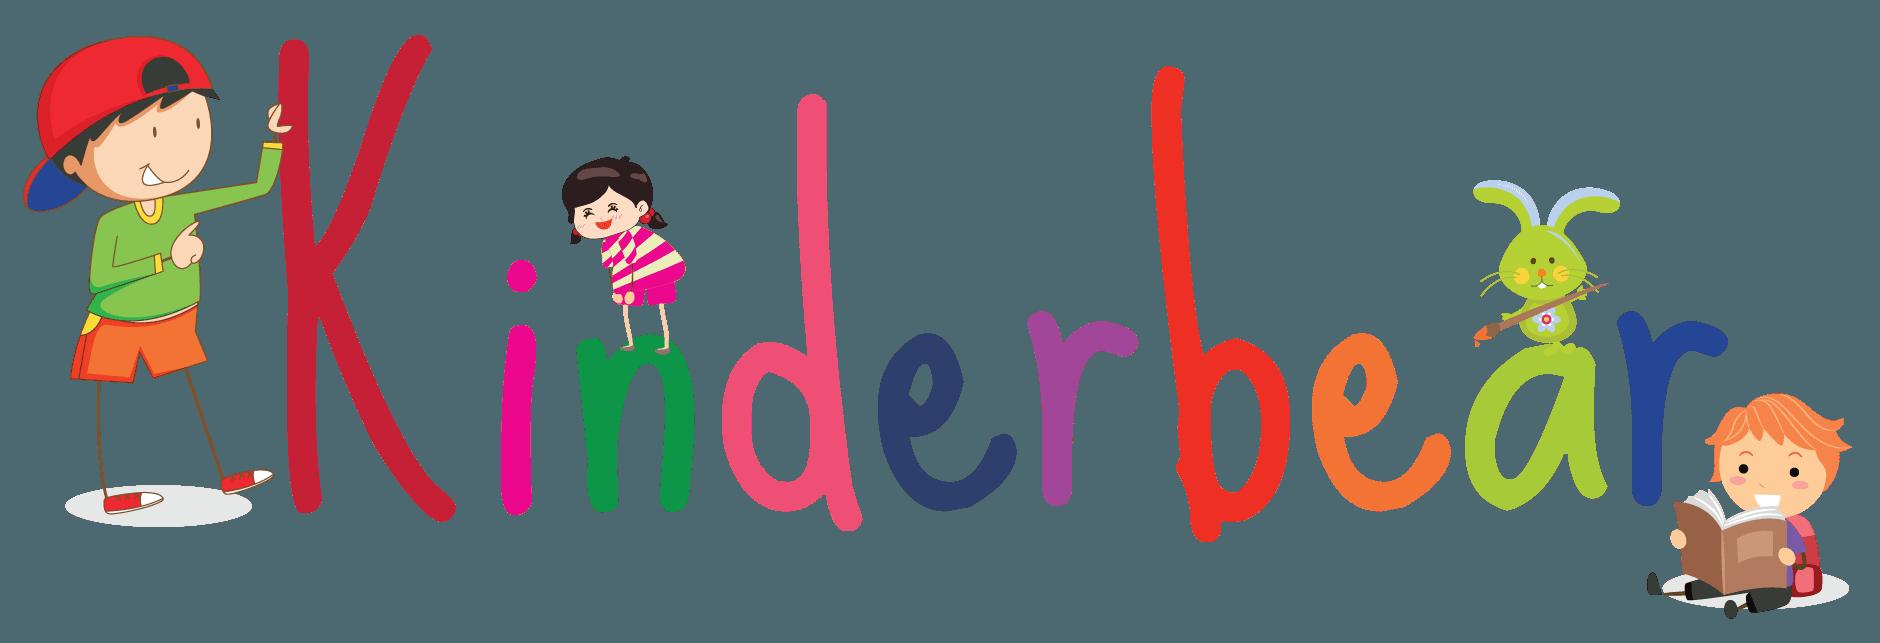 Kinderbear logo